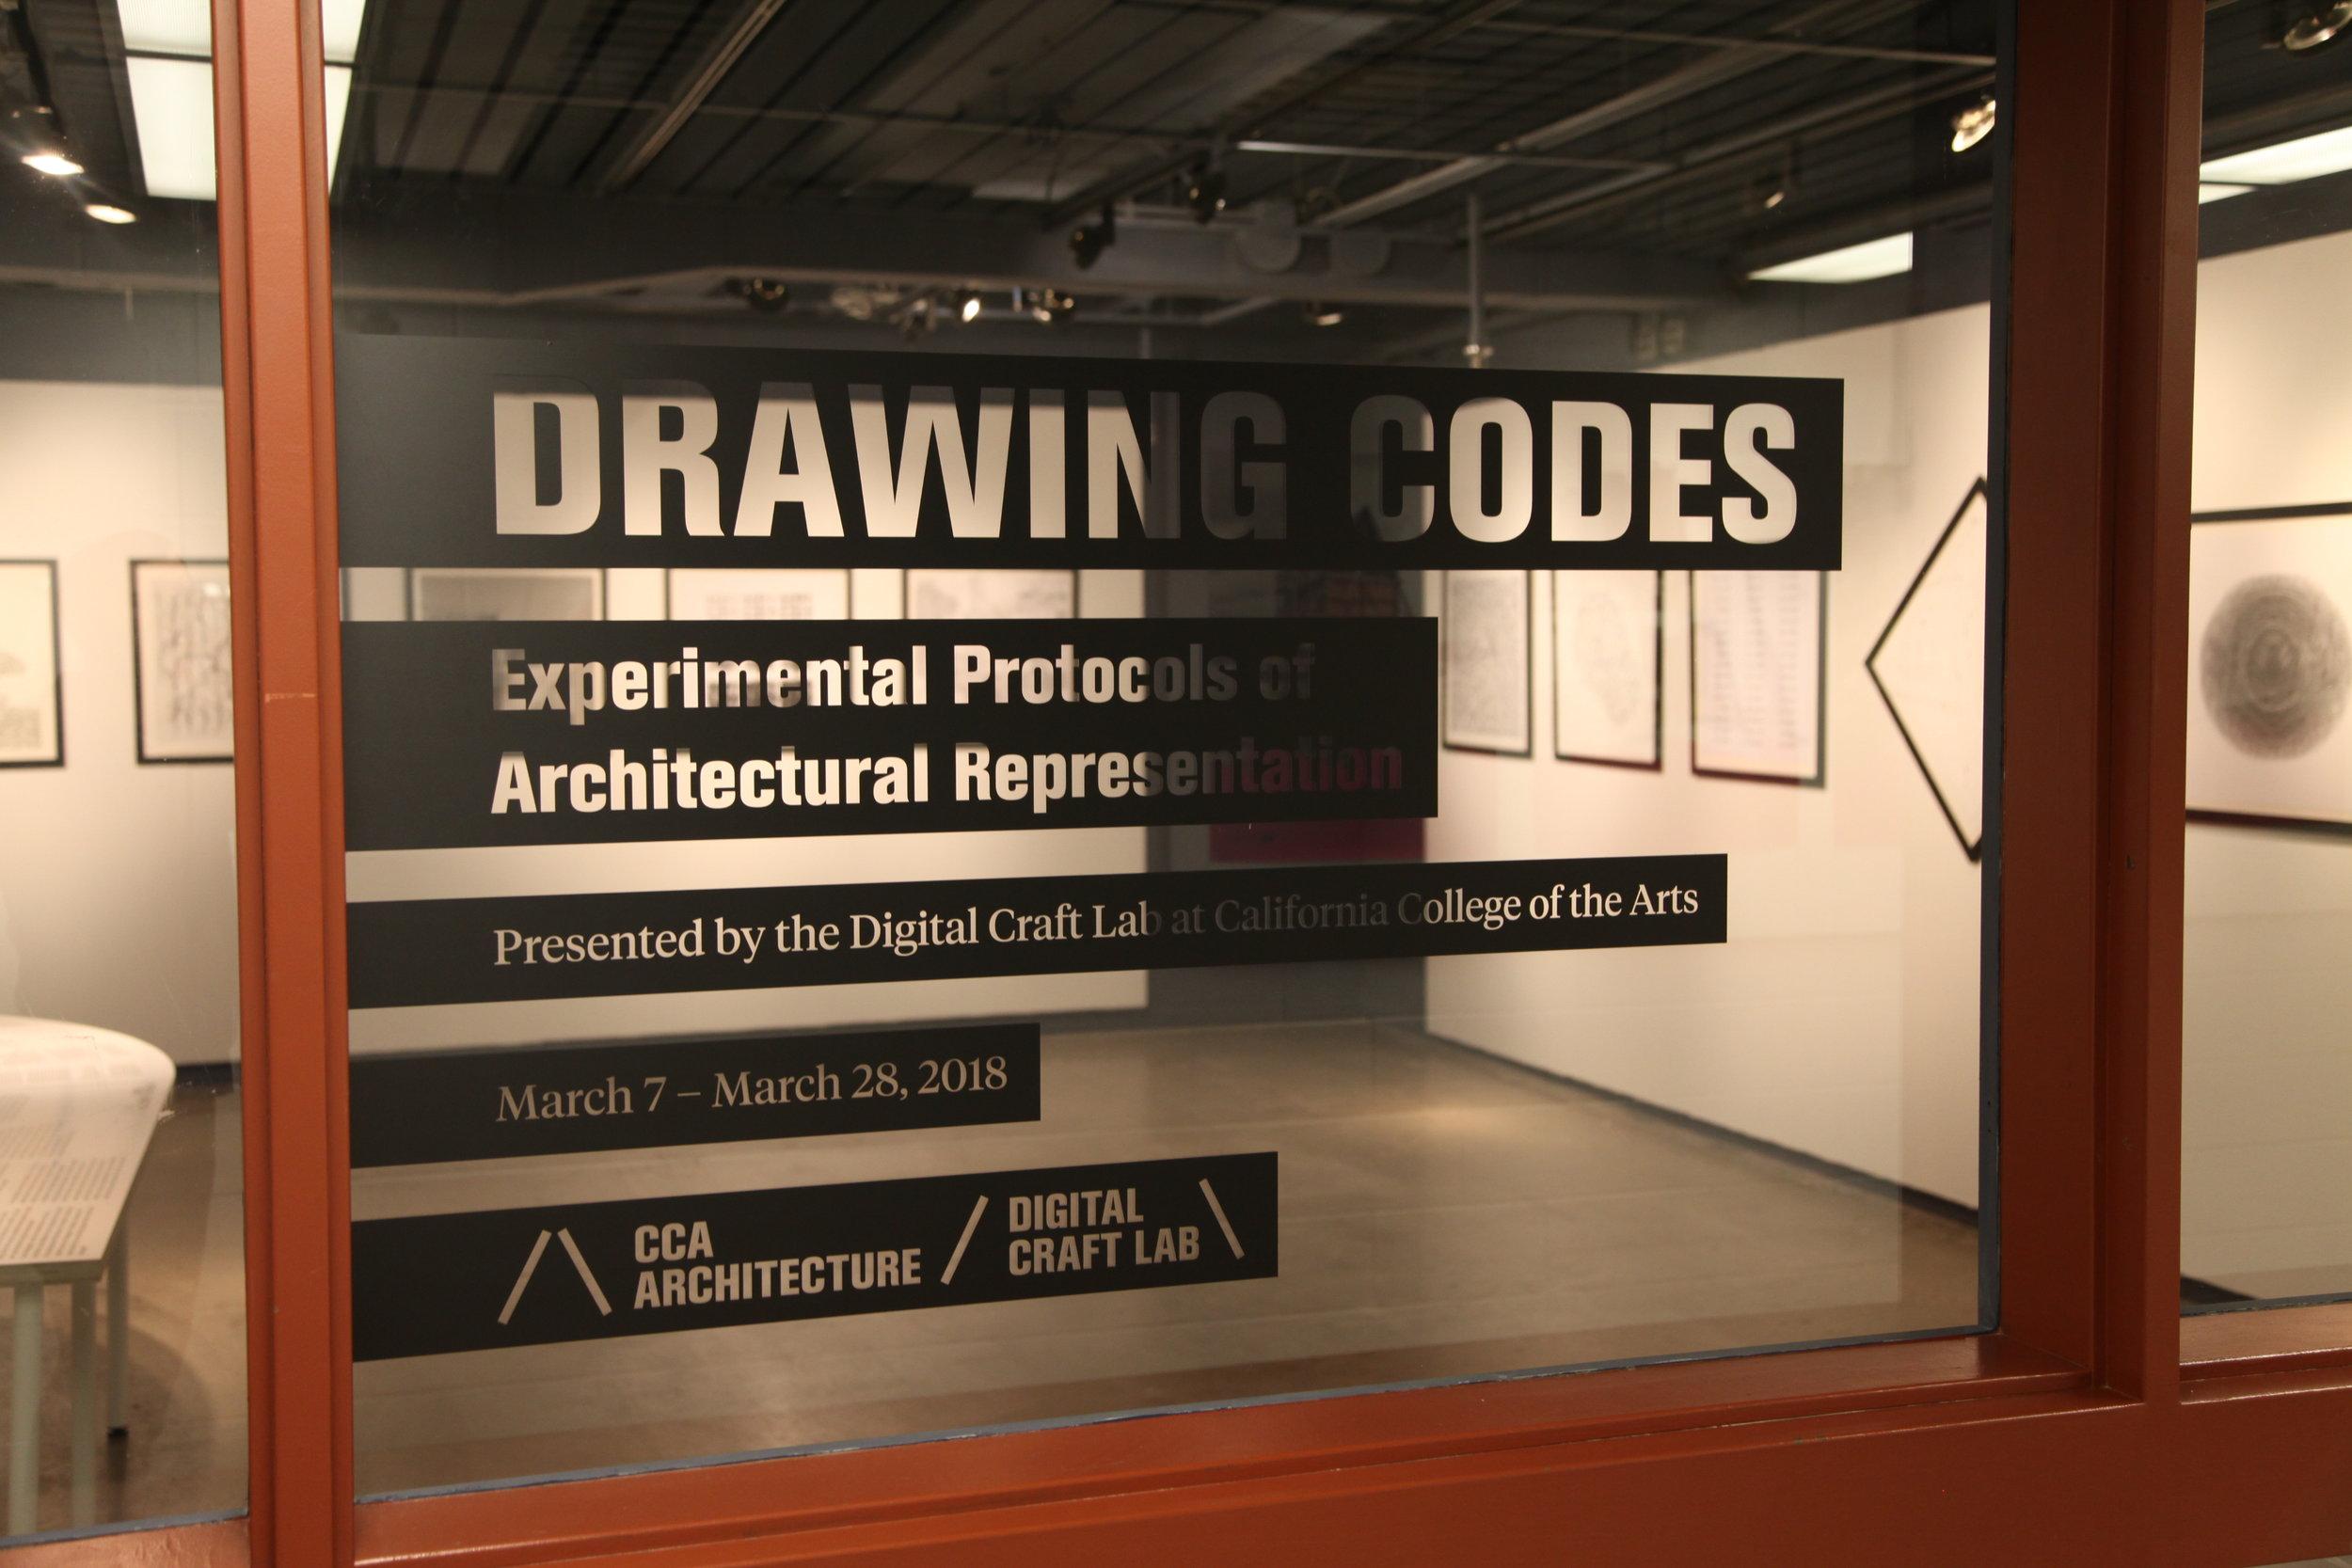 drawing-codes-exhibition_40899763951_o.jpg